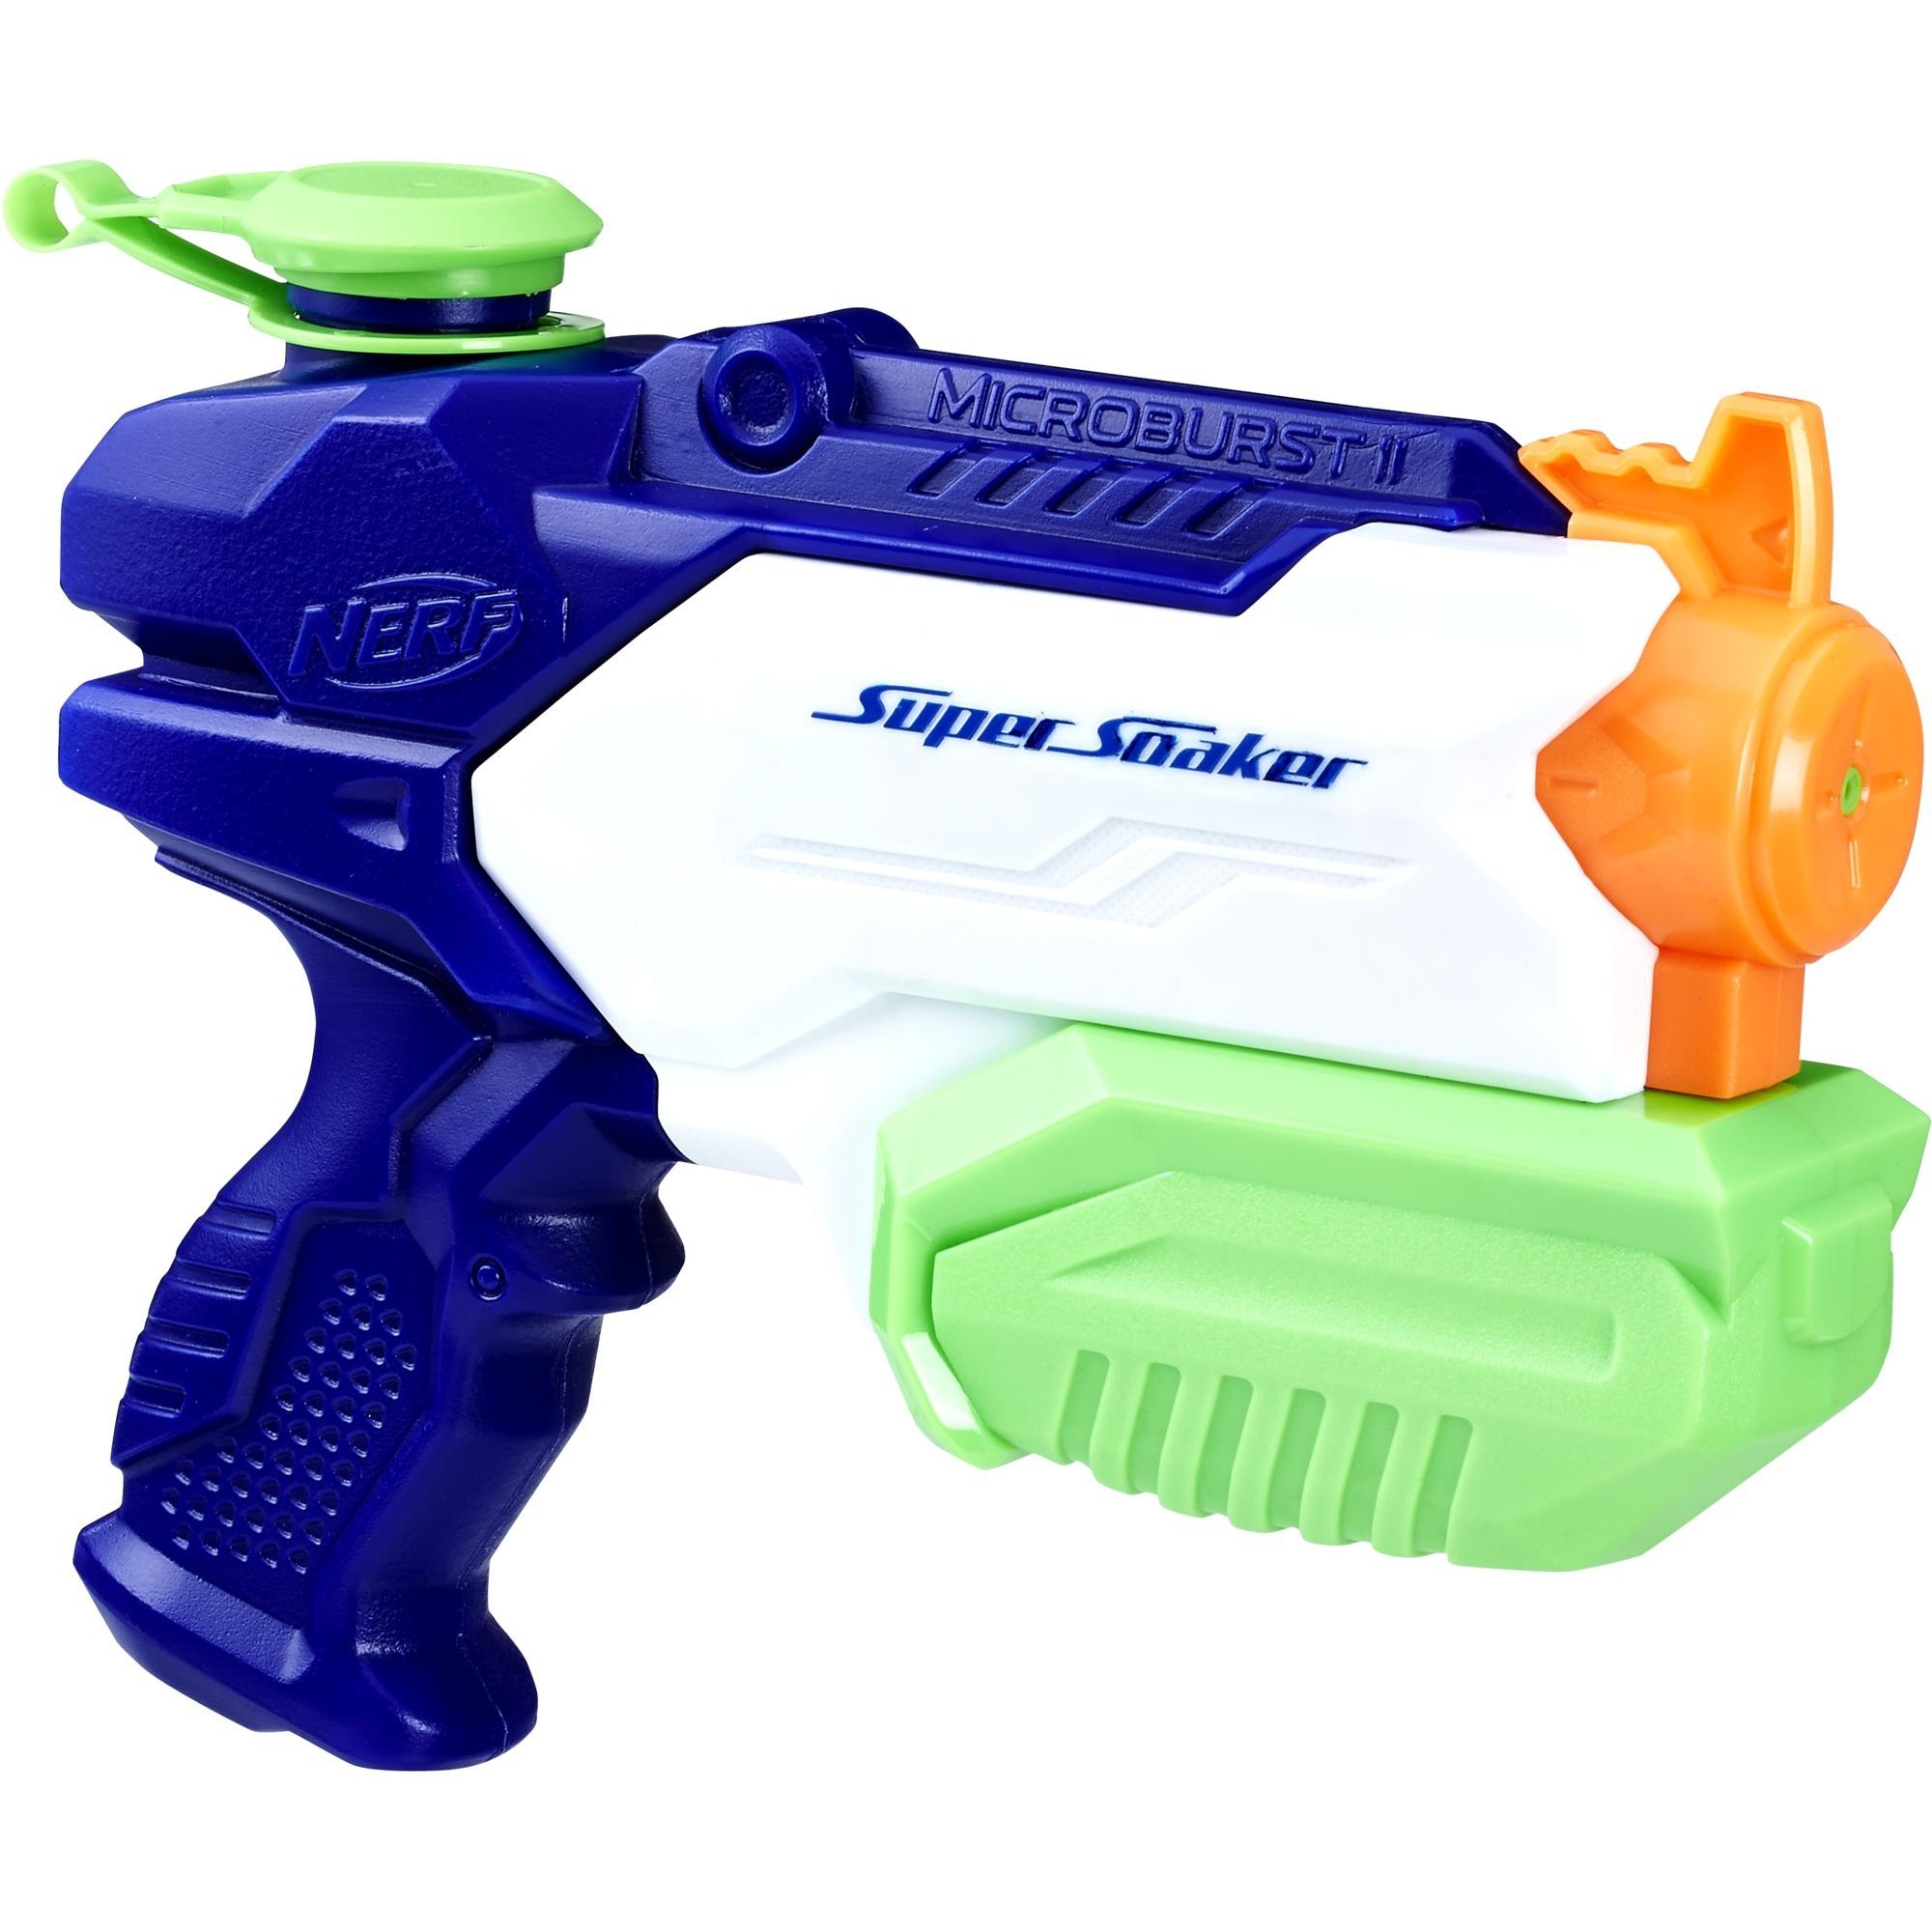 A9461EU6 pistola de agua 0,3 L